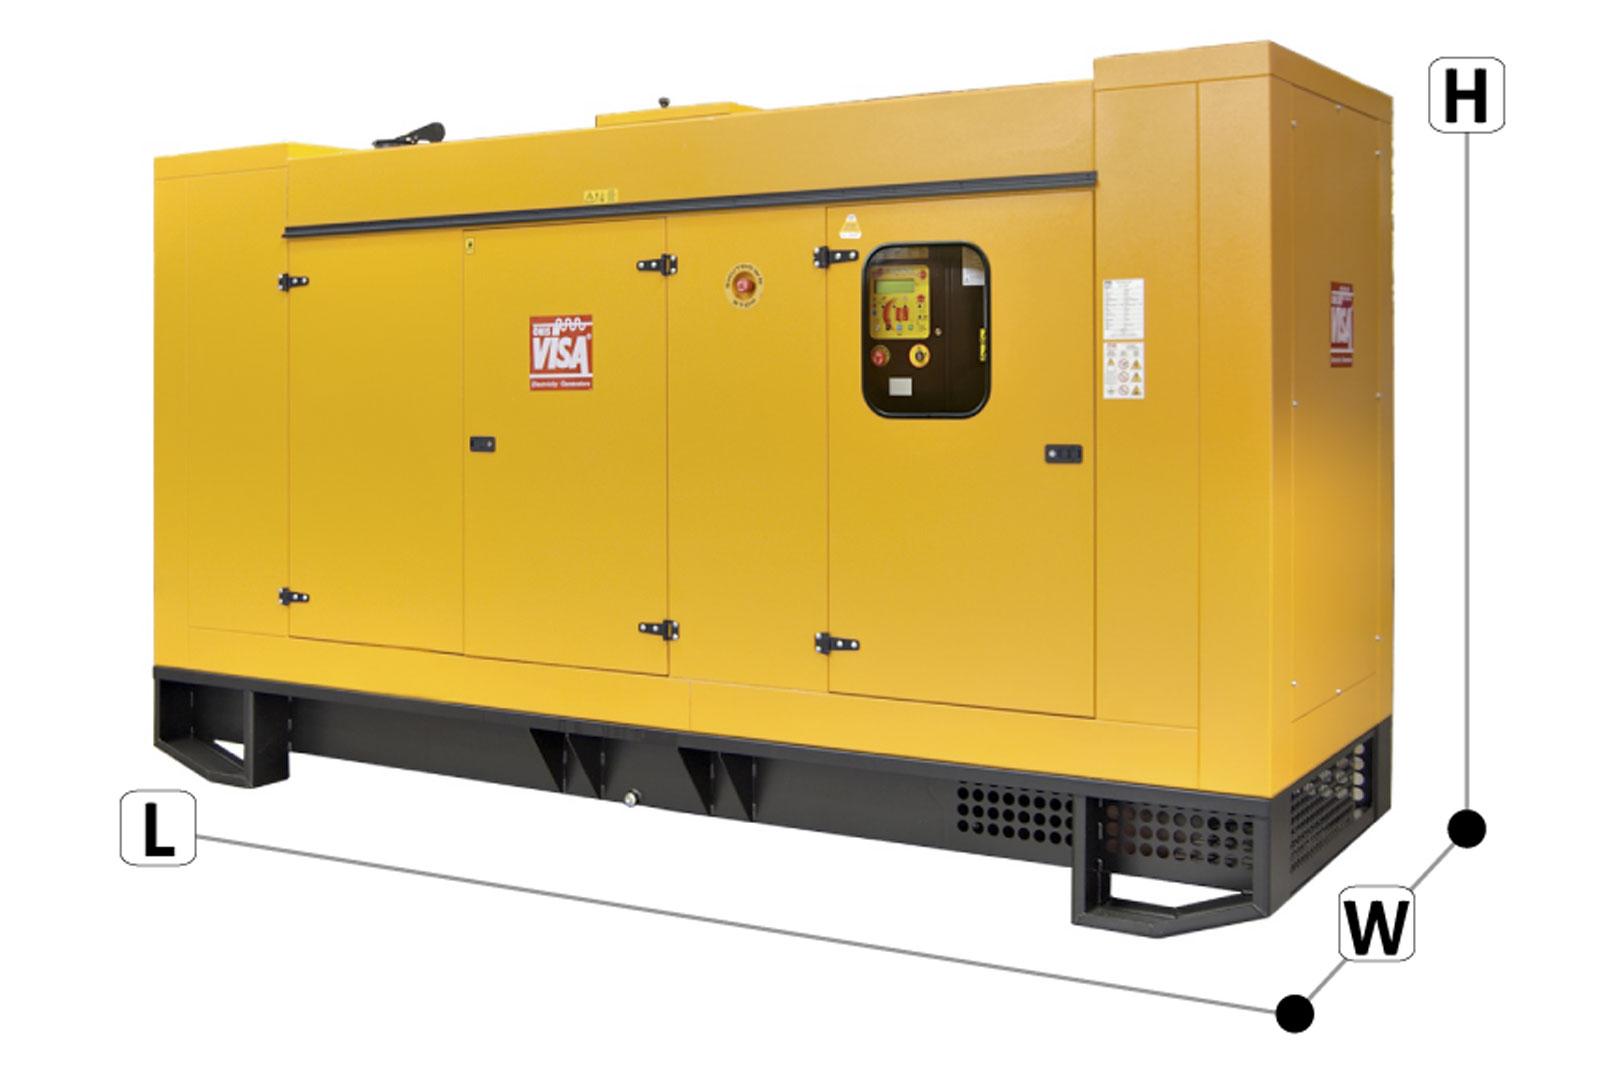 Doosan ds455gxhd diesel generators - Diesel generators pros and cons ...